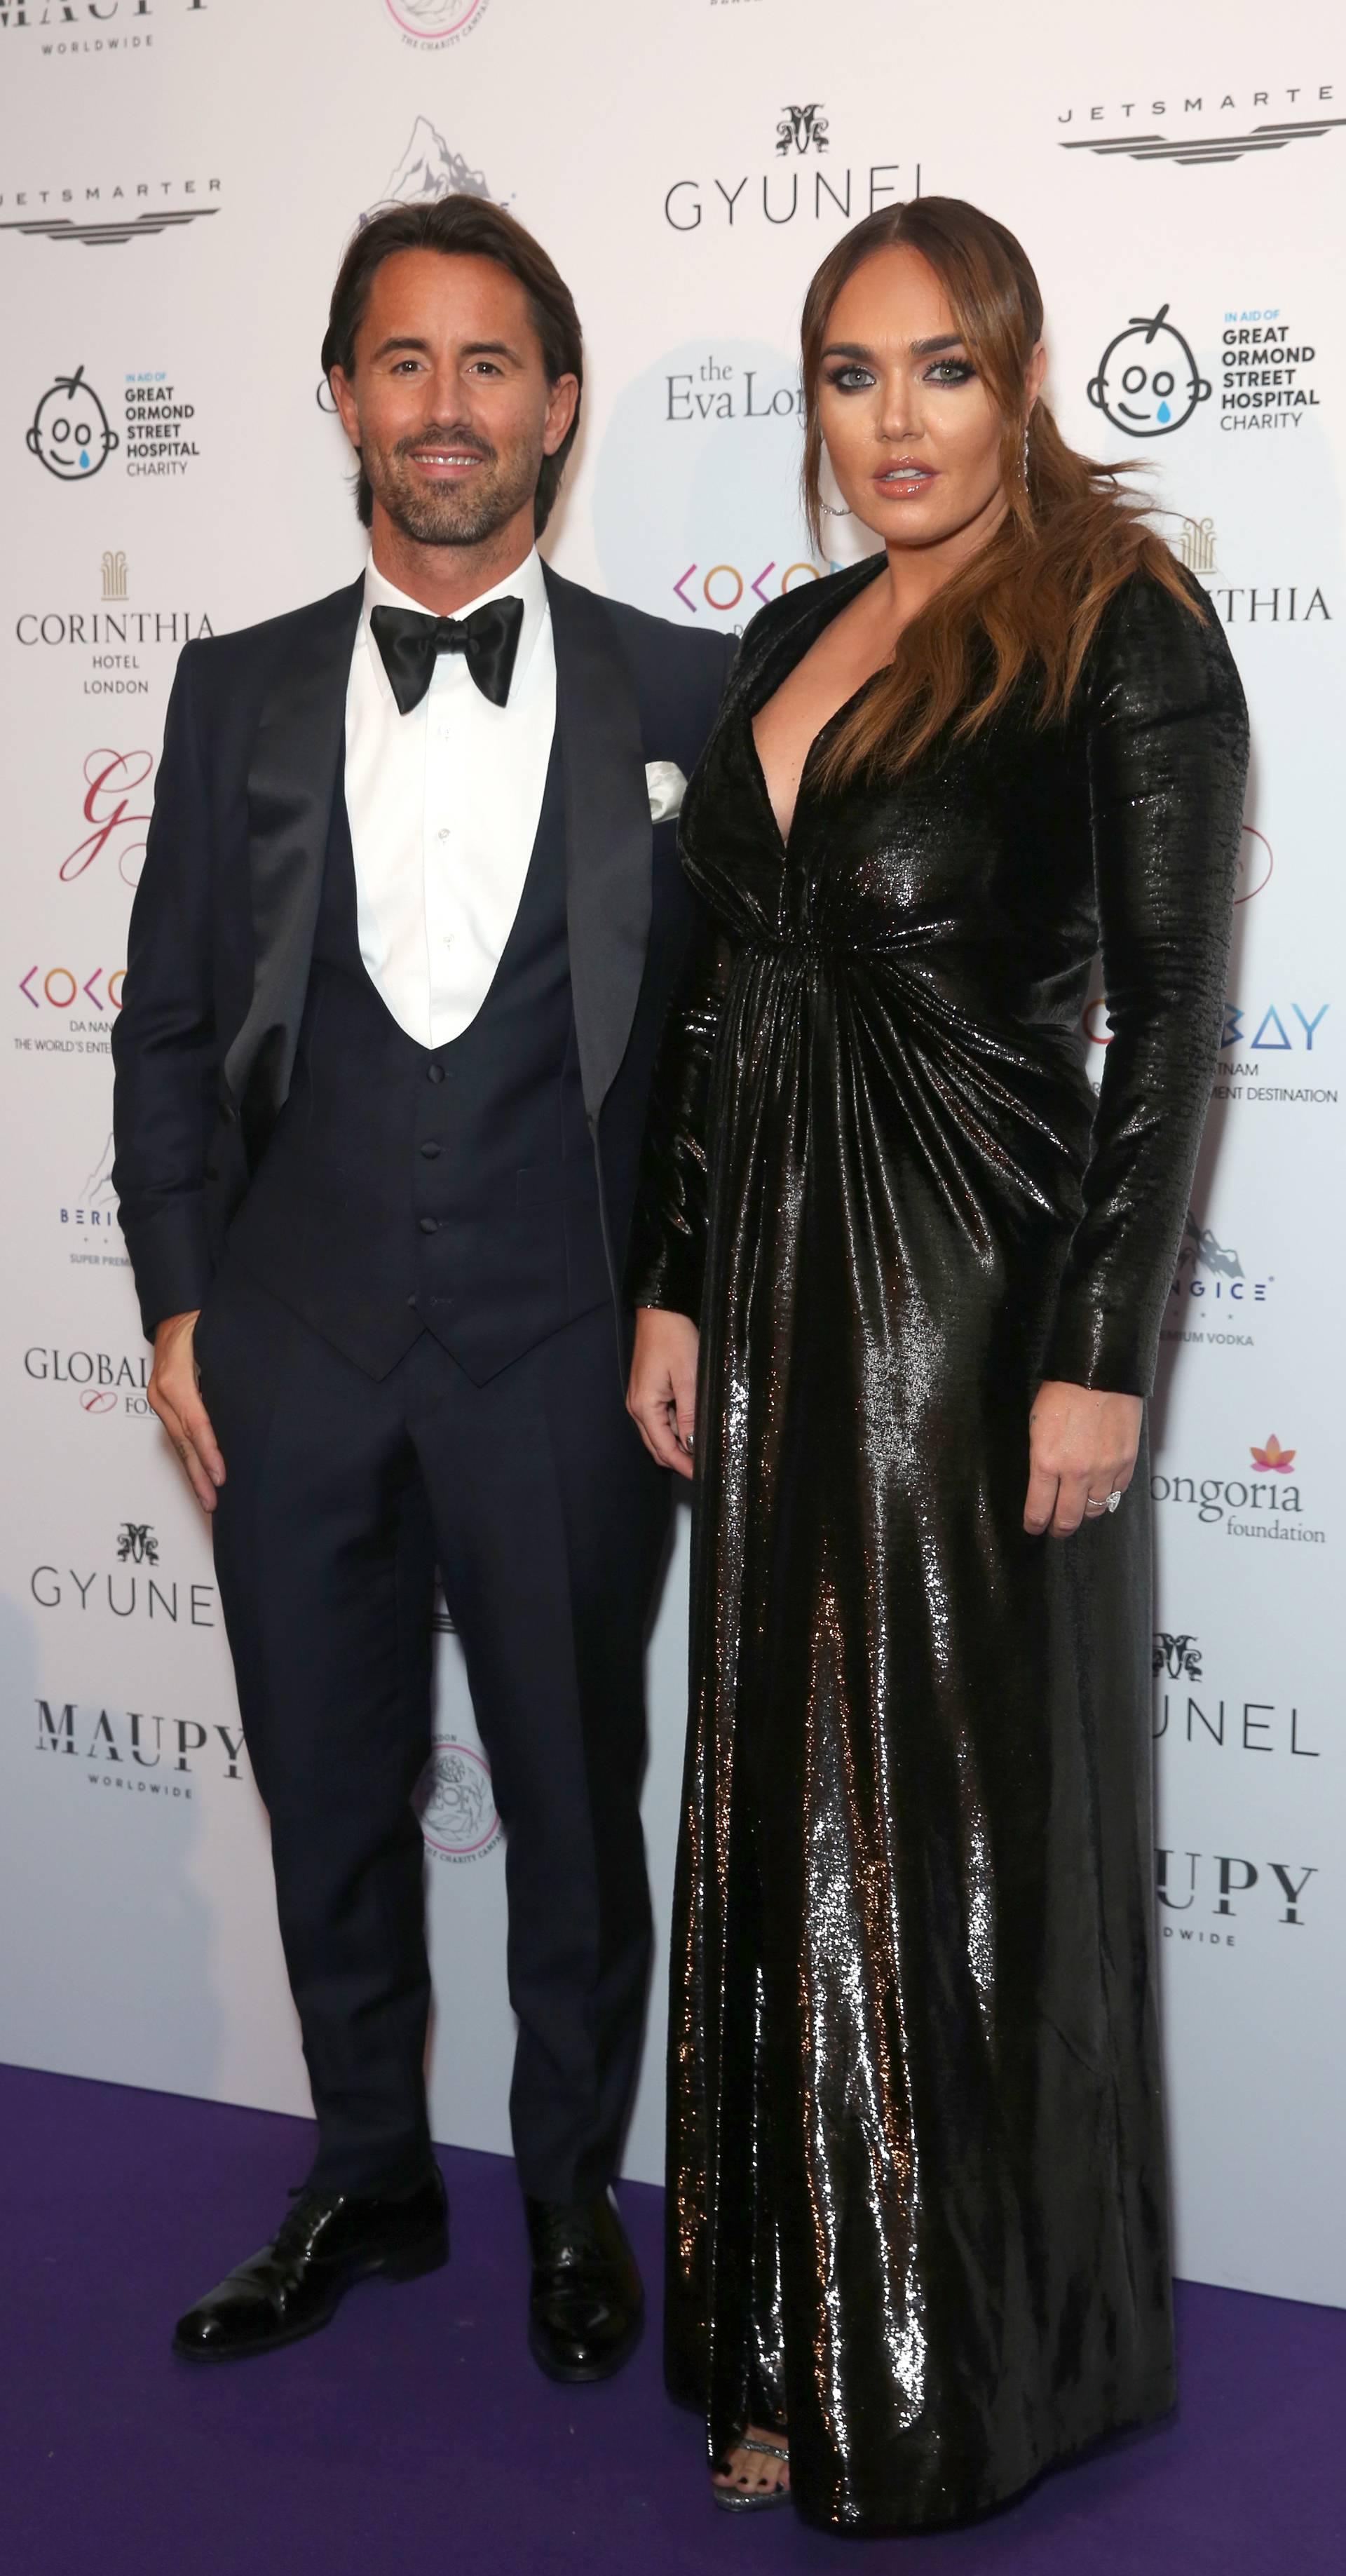 Global Gift Gala 2017 - London